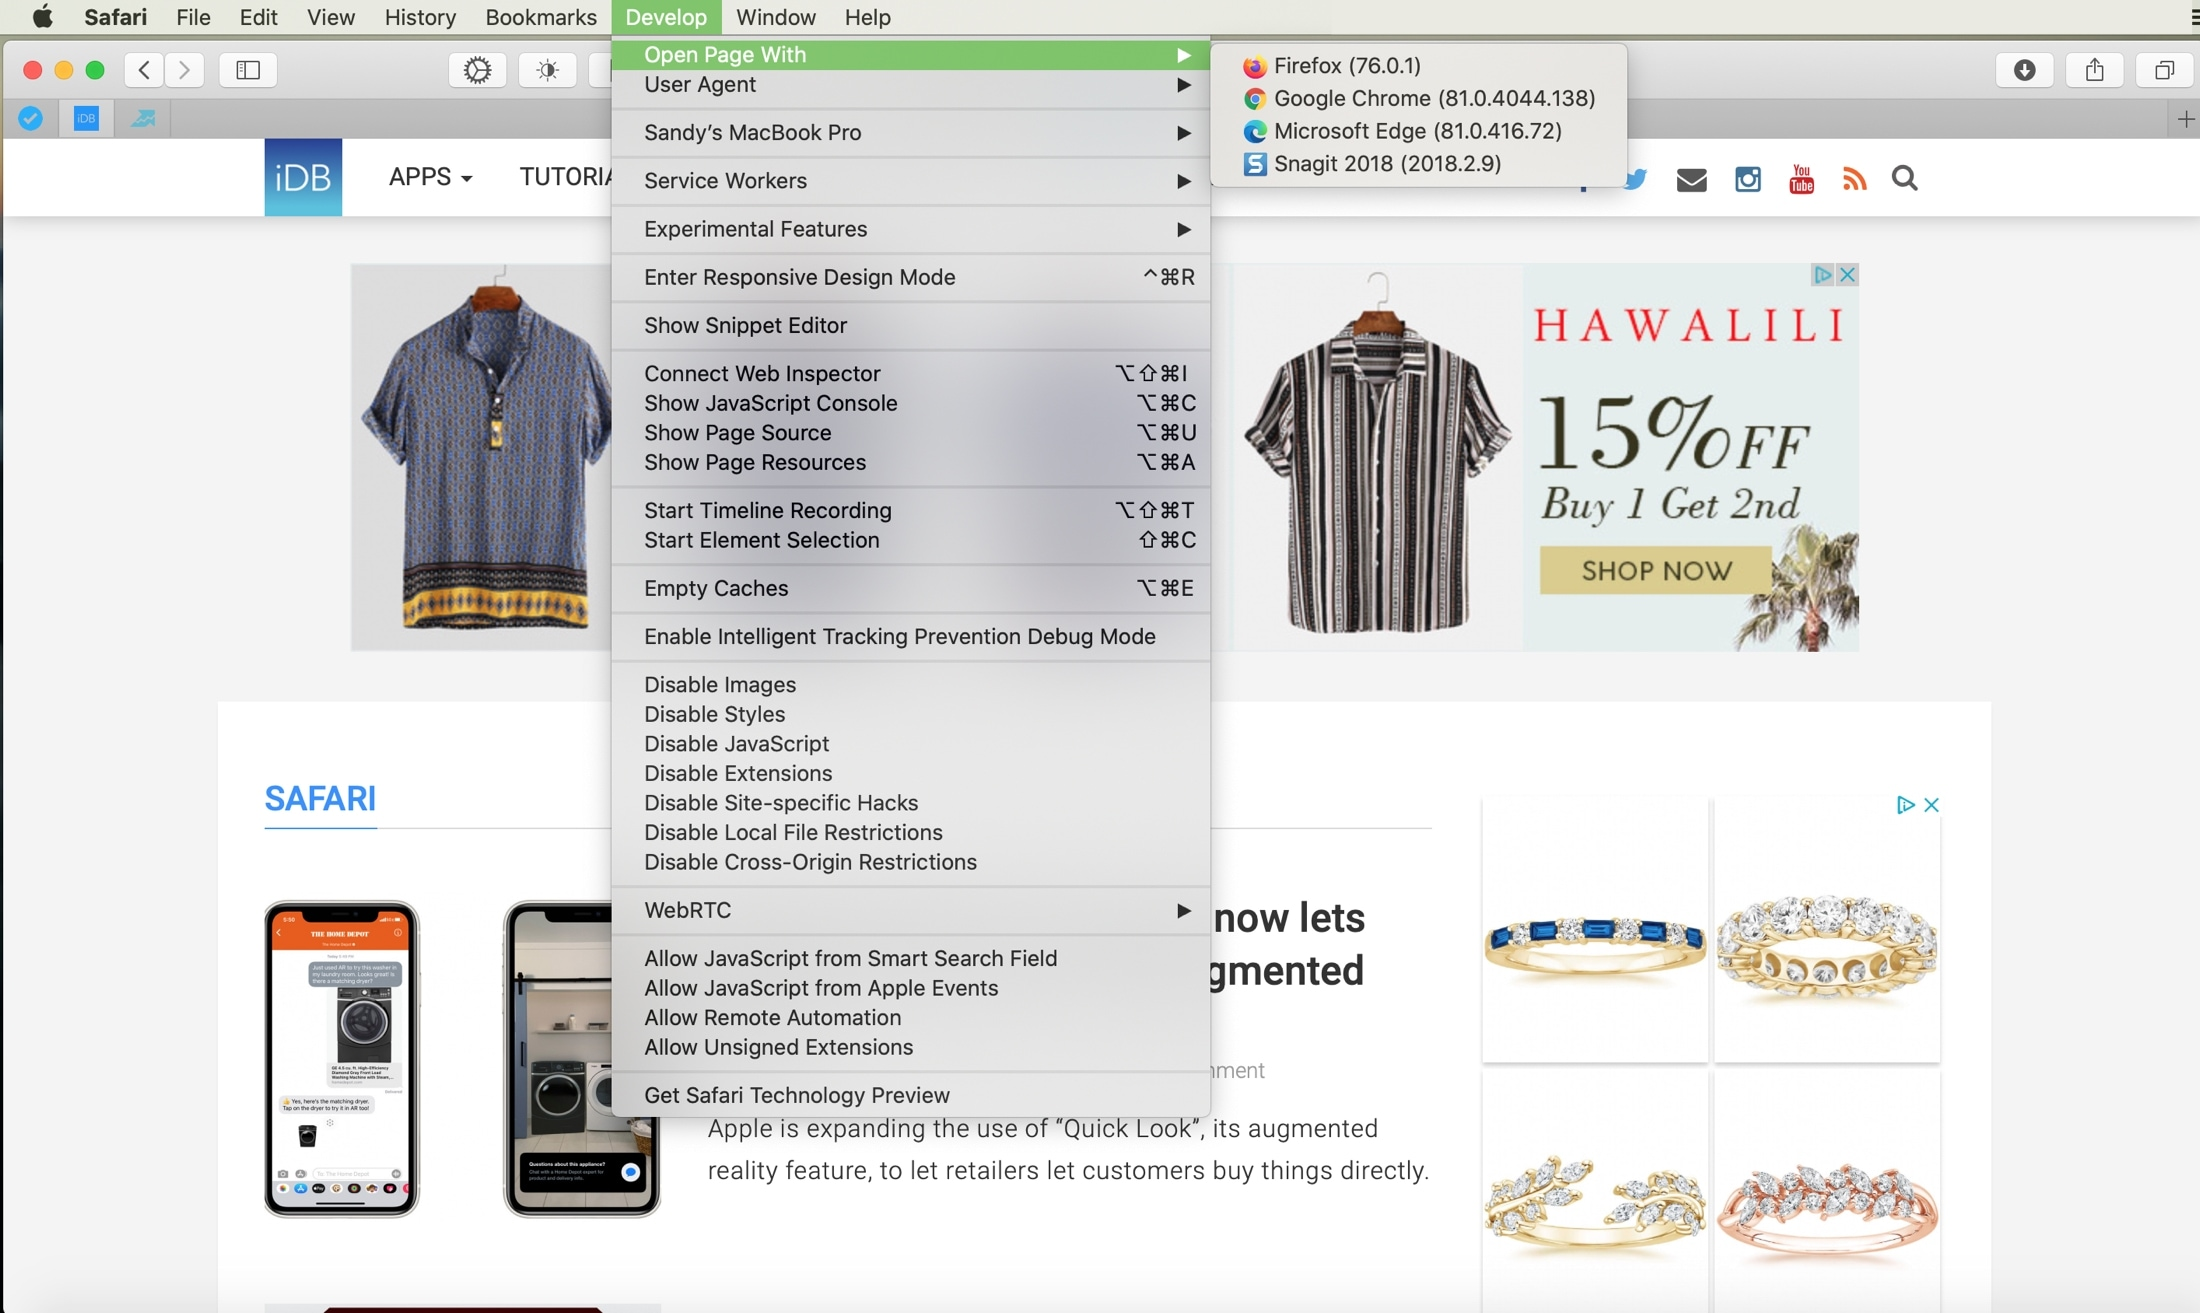 Safari Menu Bar Open Page With